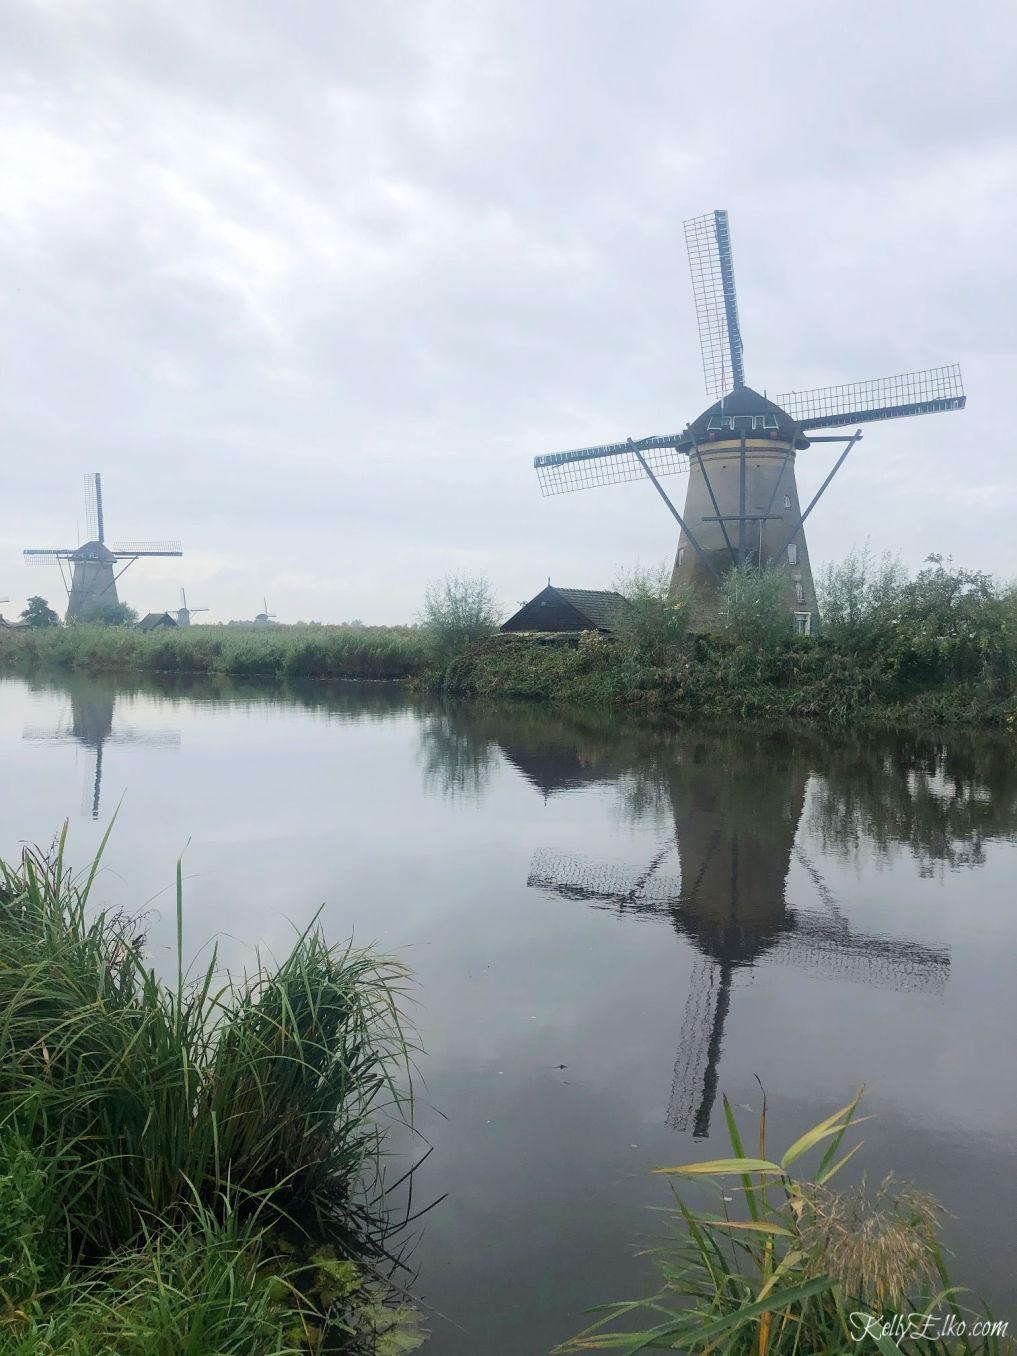 Kinderdijk Netherlands is a UNESCO World Heritage site of 19 windmills kellyelko.com #windmills #kinderdijk #netherlands #trravel #travelblogger #europetravel #rivercruise #rhineriver